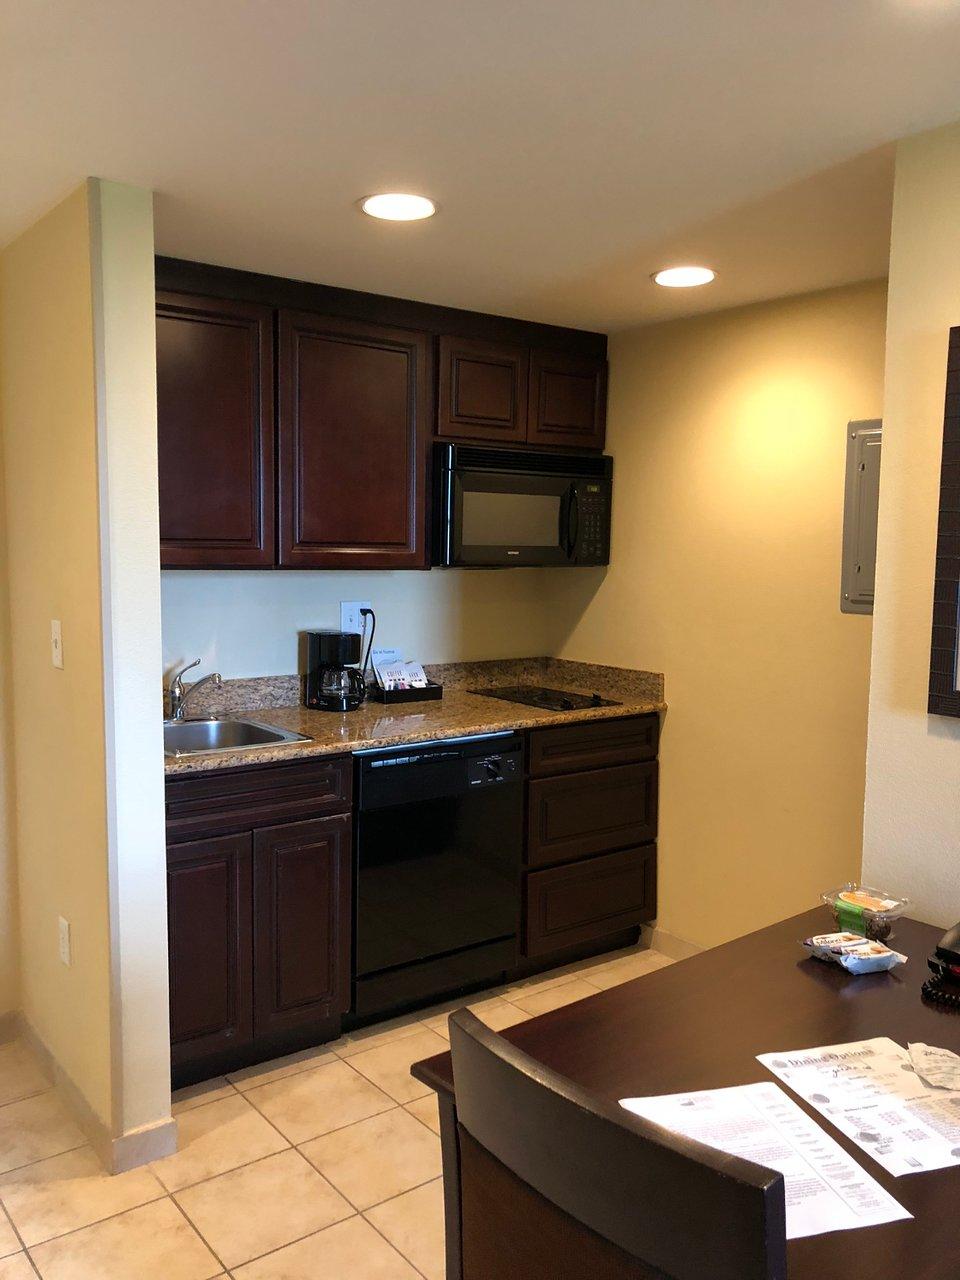 HOMEWOOD SUITES BY HILTON LAKE BUENA VISTA-ORLANDO $89 ($̶1̶2̶3̶ ...